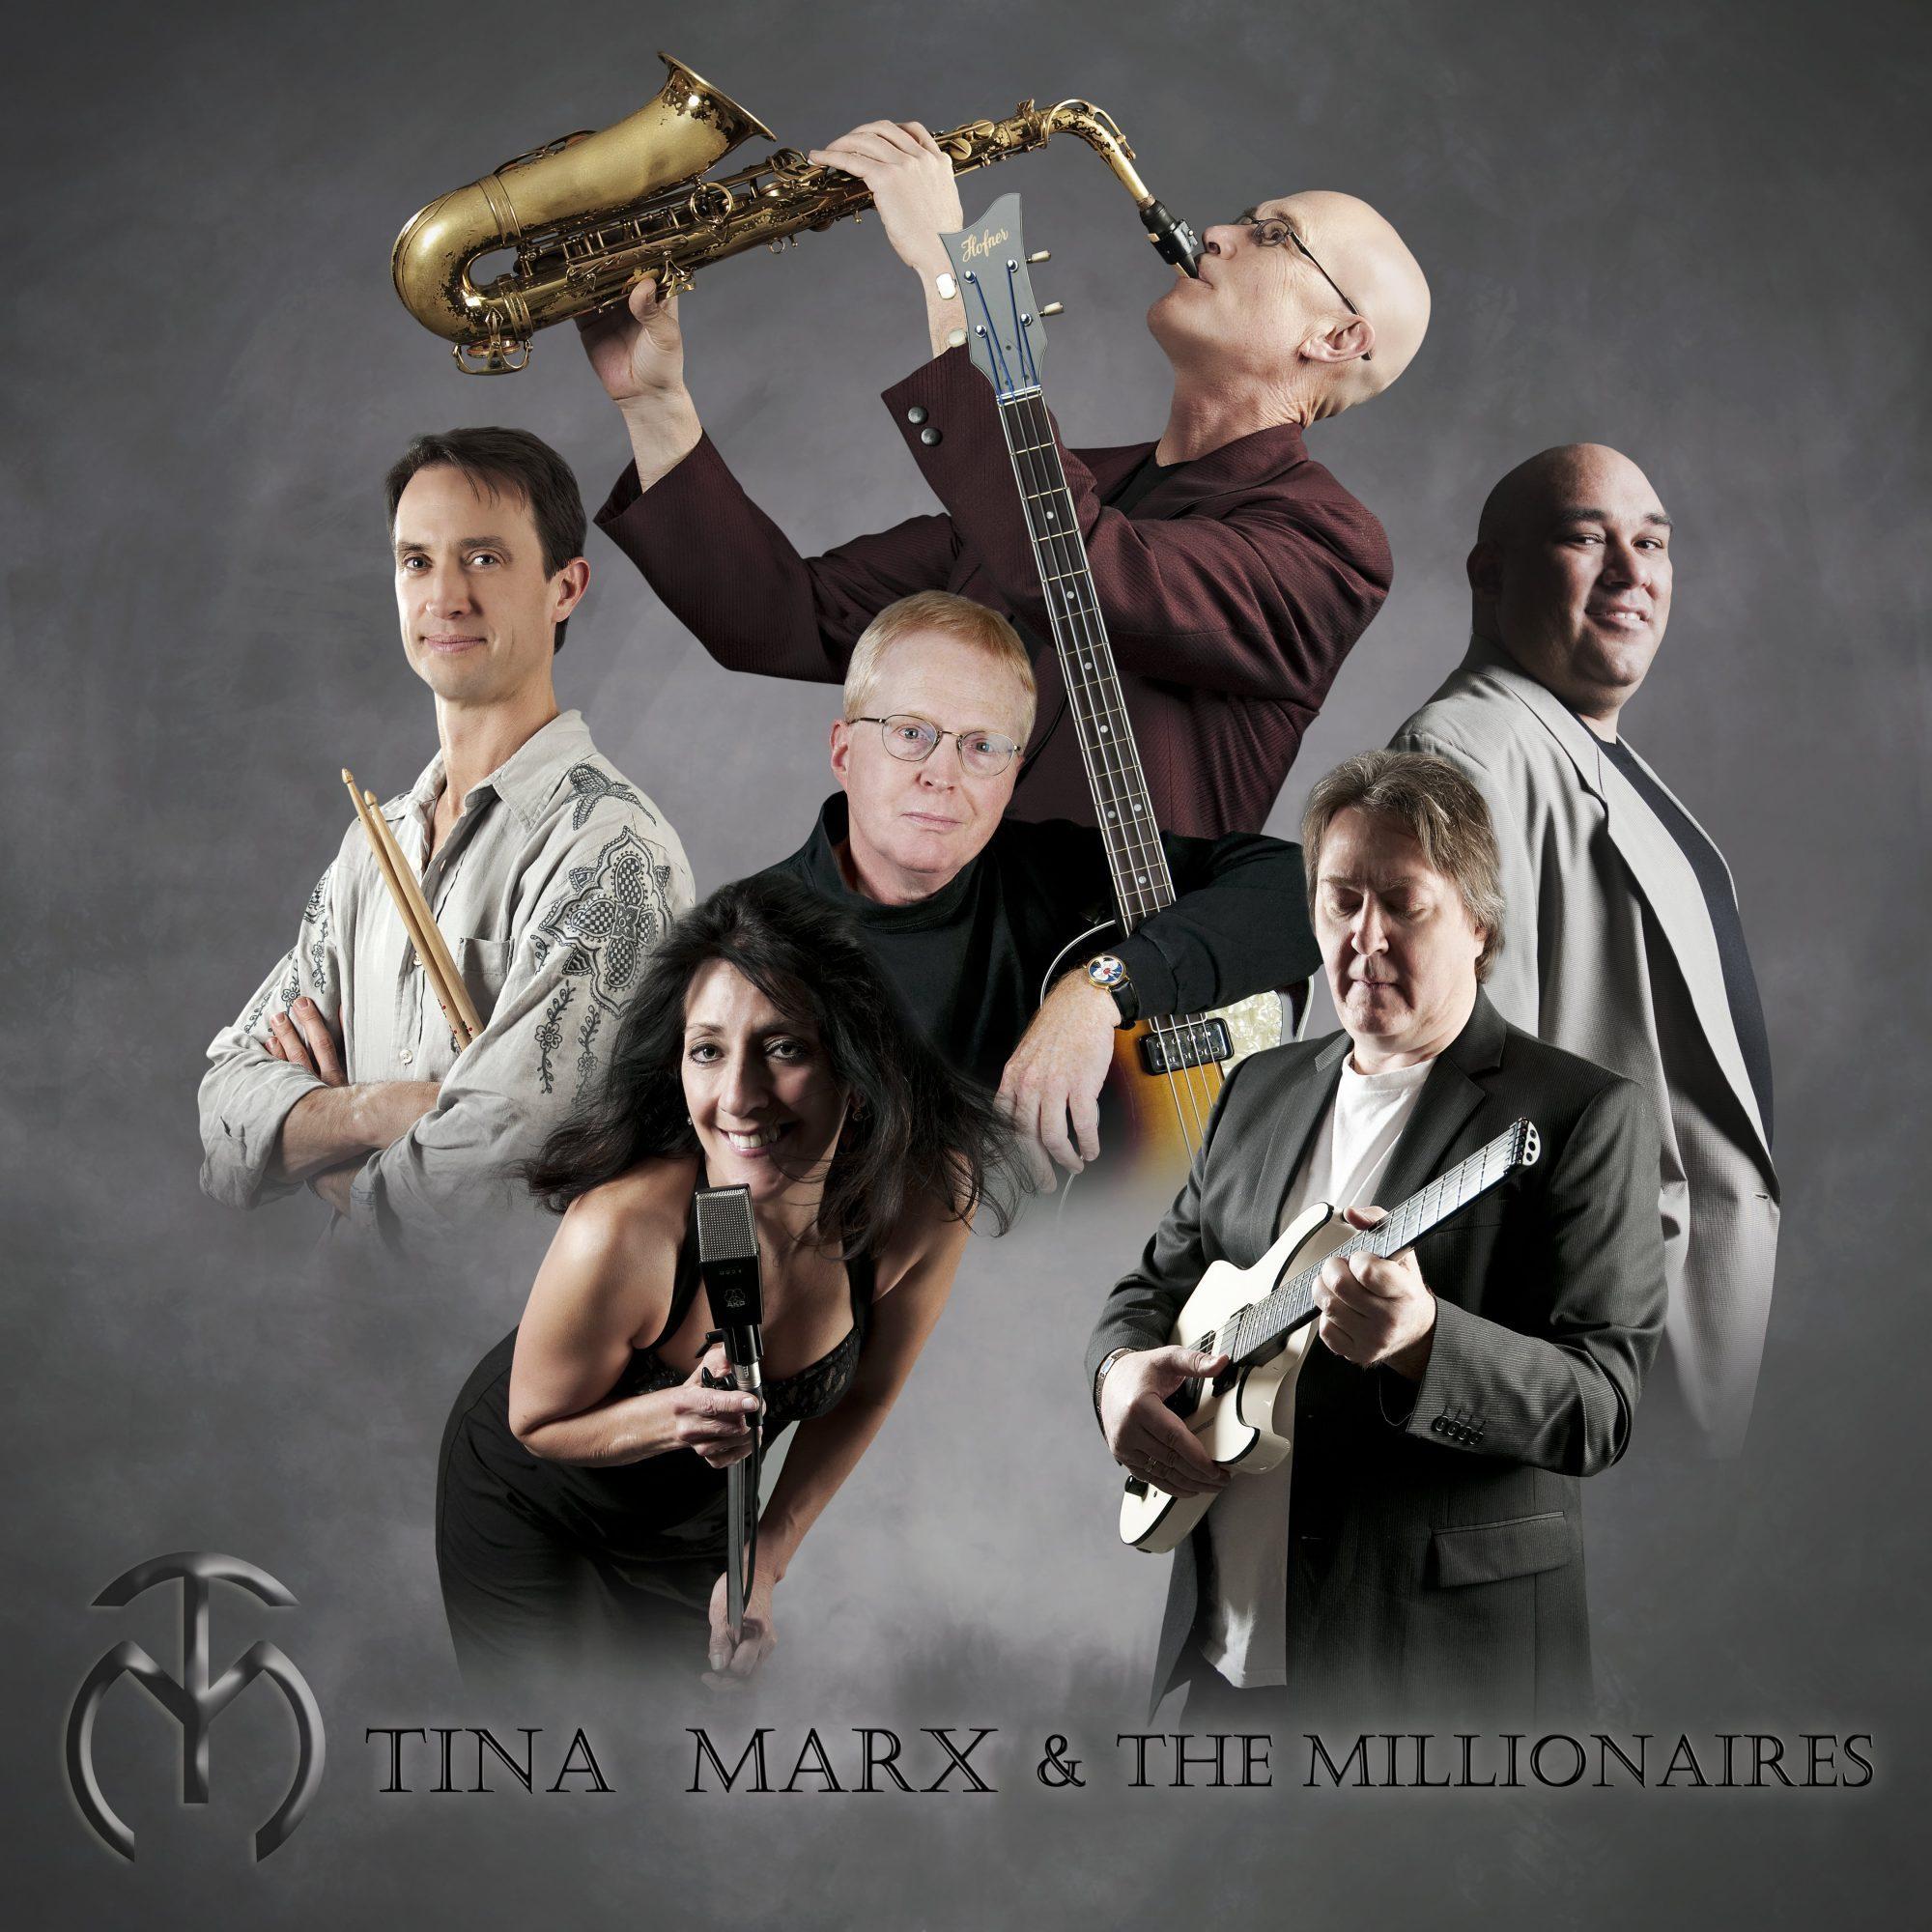 Tina Marx & The Millionaires